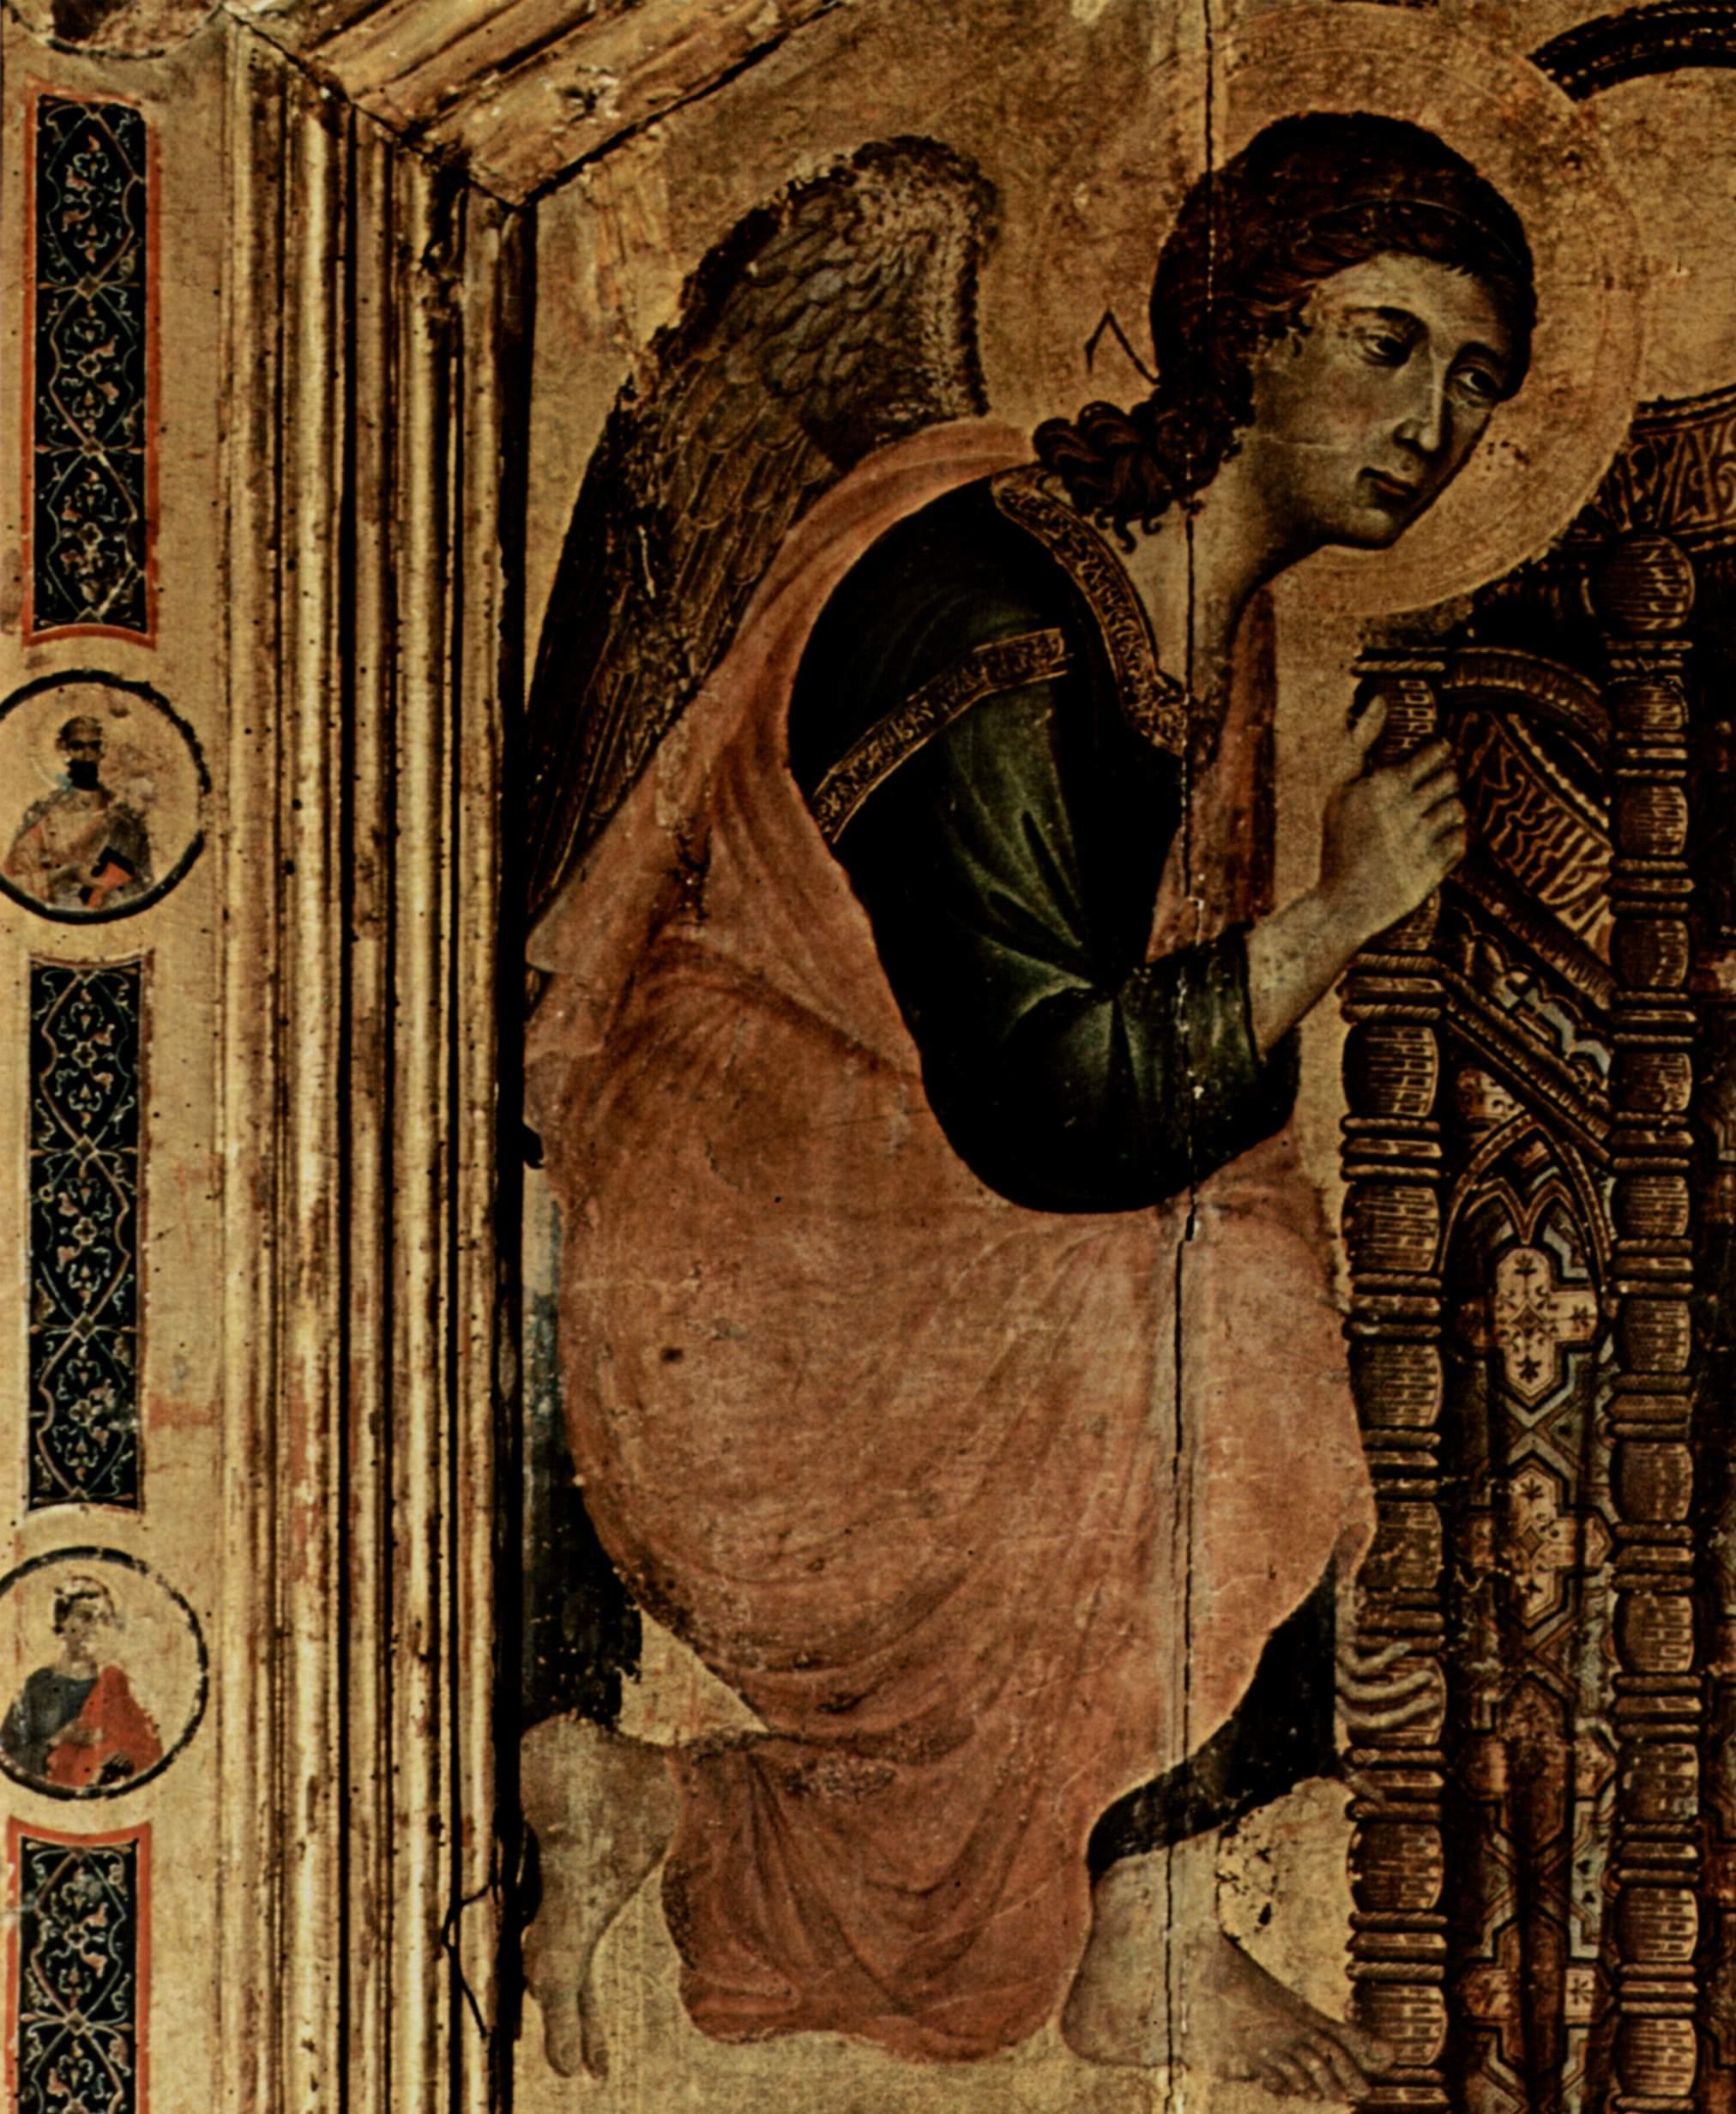 rucellai madonna Rucellai madonna c1285 tempera on wood galleria degli uffizi, florence, italy deposited in the church santa maria novella, florence, italy.